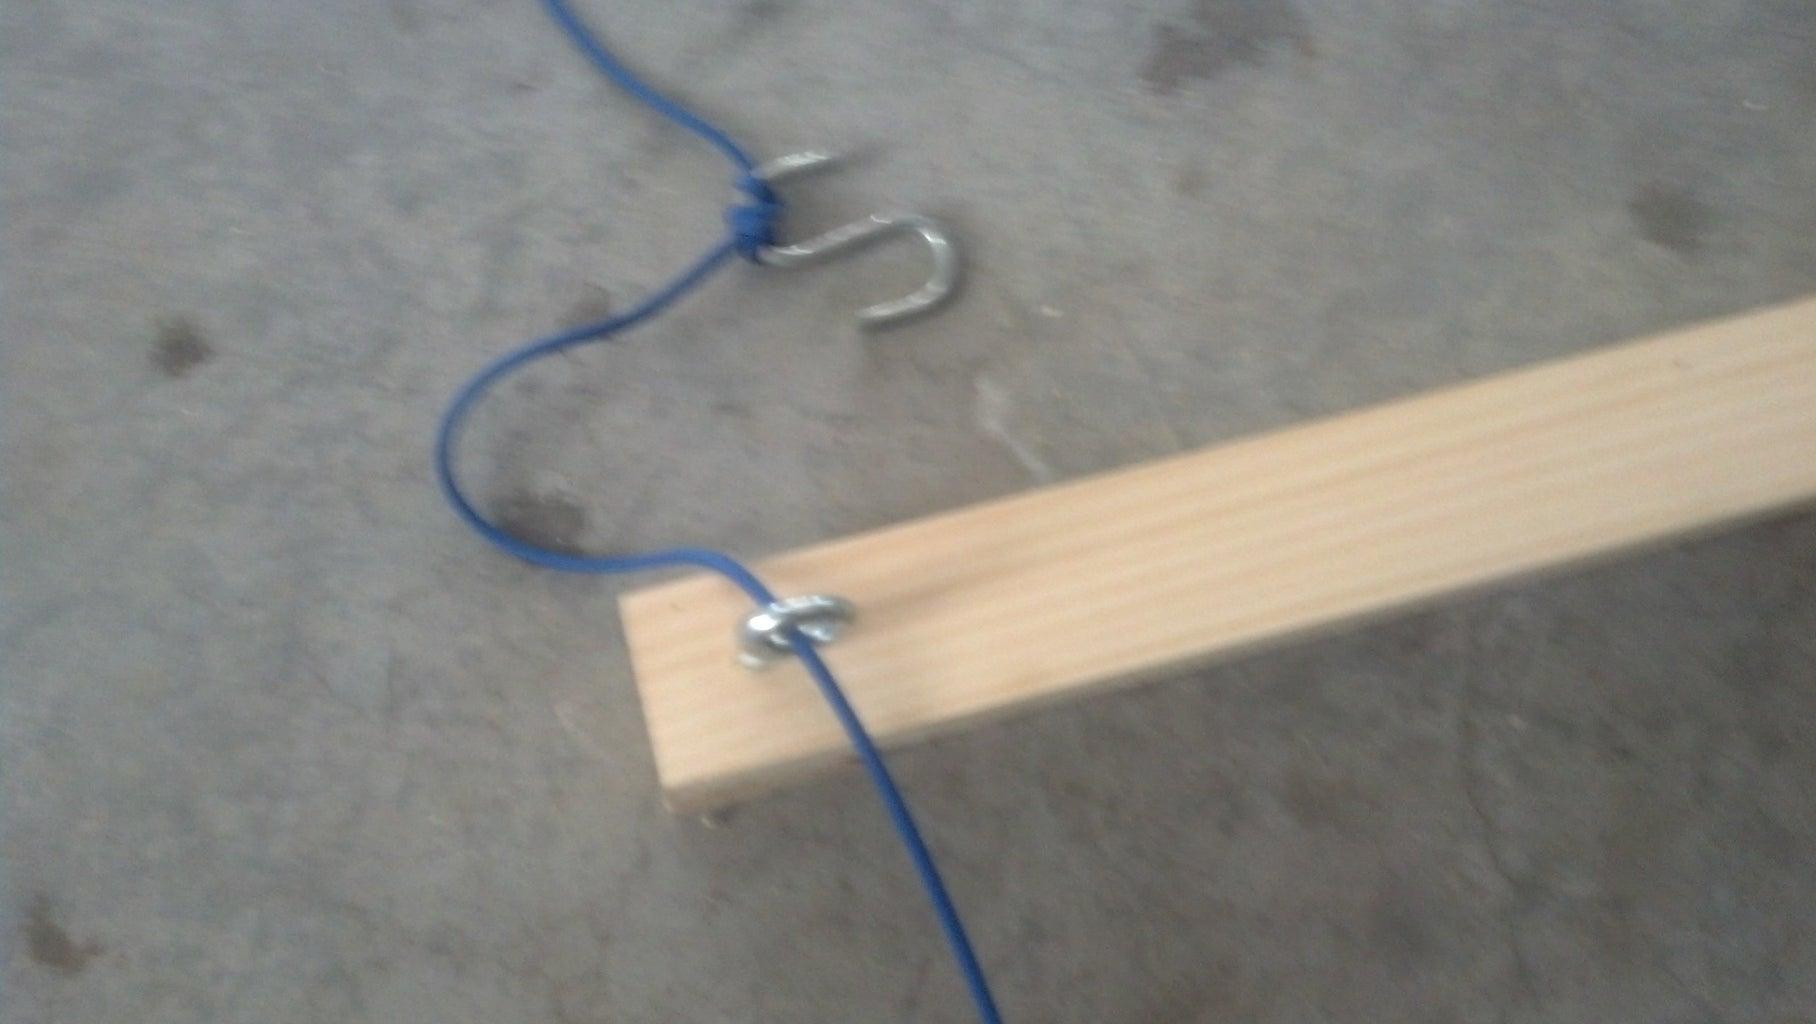 Thread the Paracord Through Eye Screw and Tie an Anchor Loop